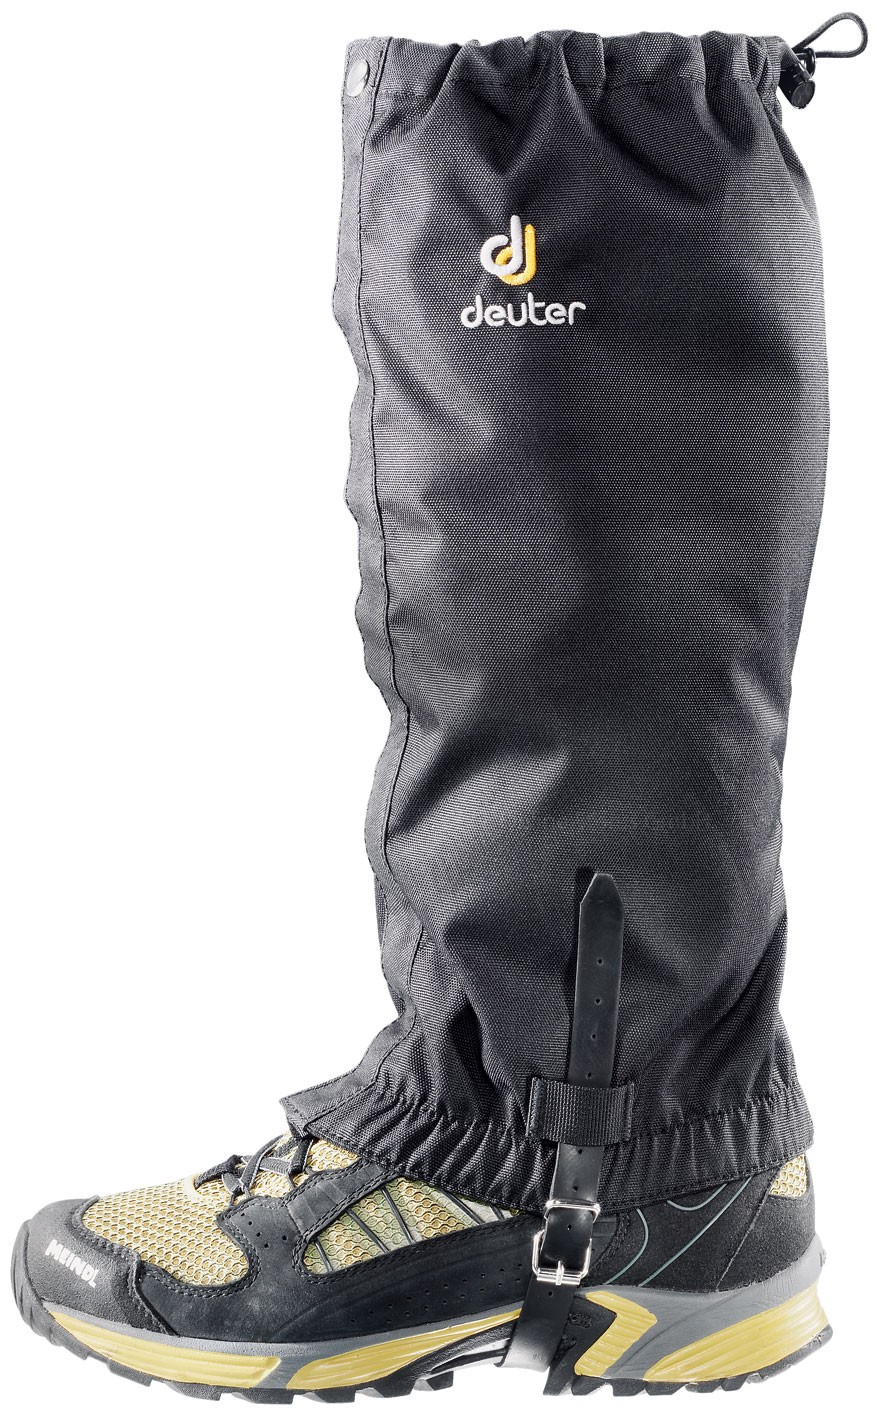 Deuter Boulder Gaiter Short